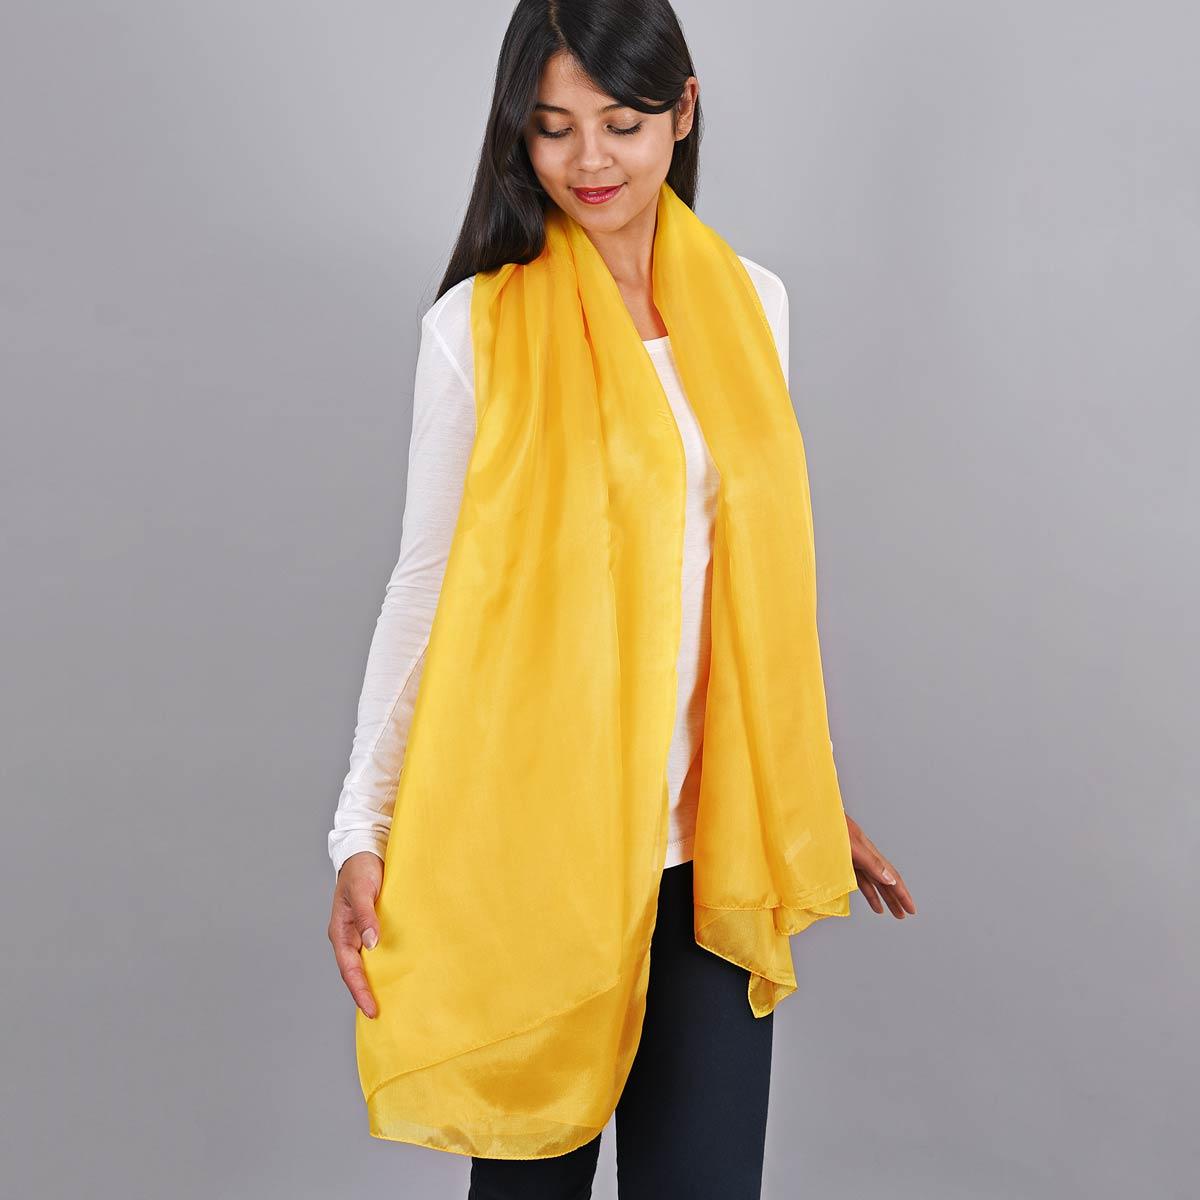 _Etole-en-soie-jaune-moutarde